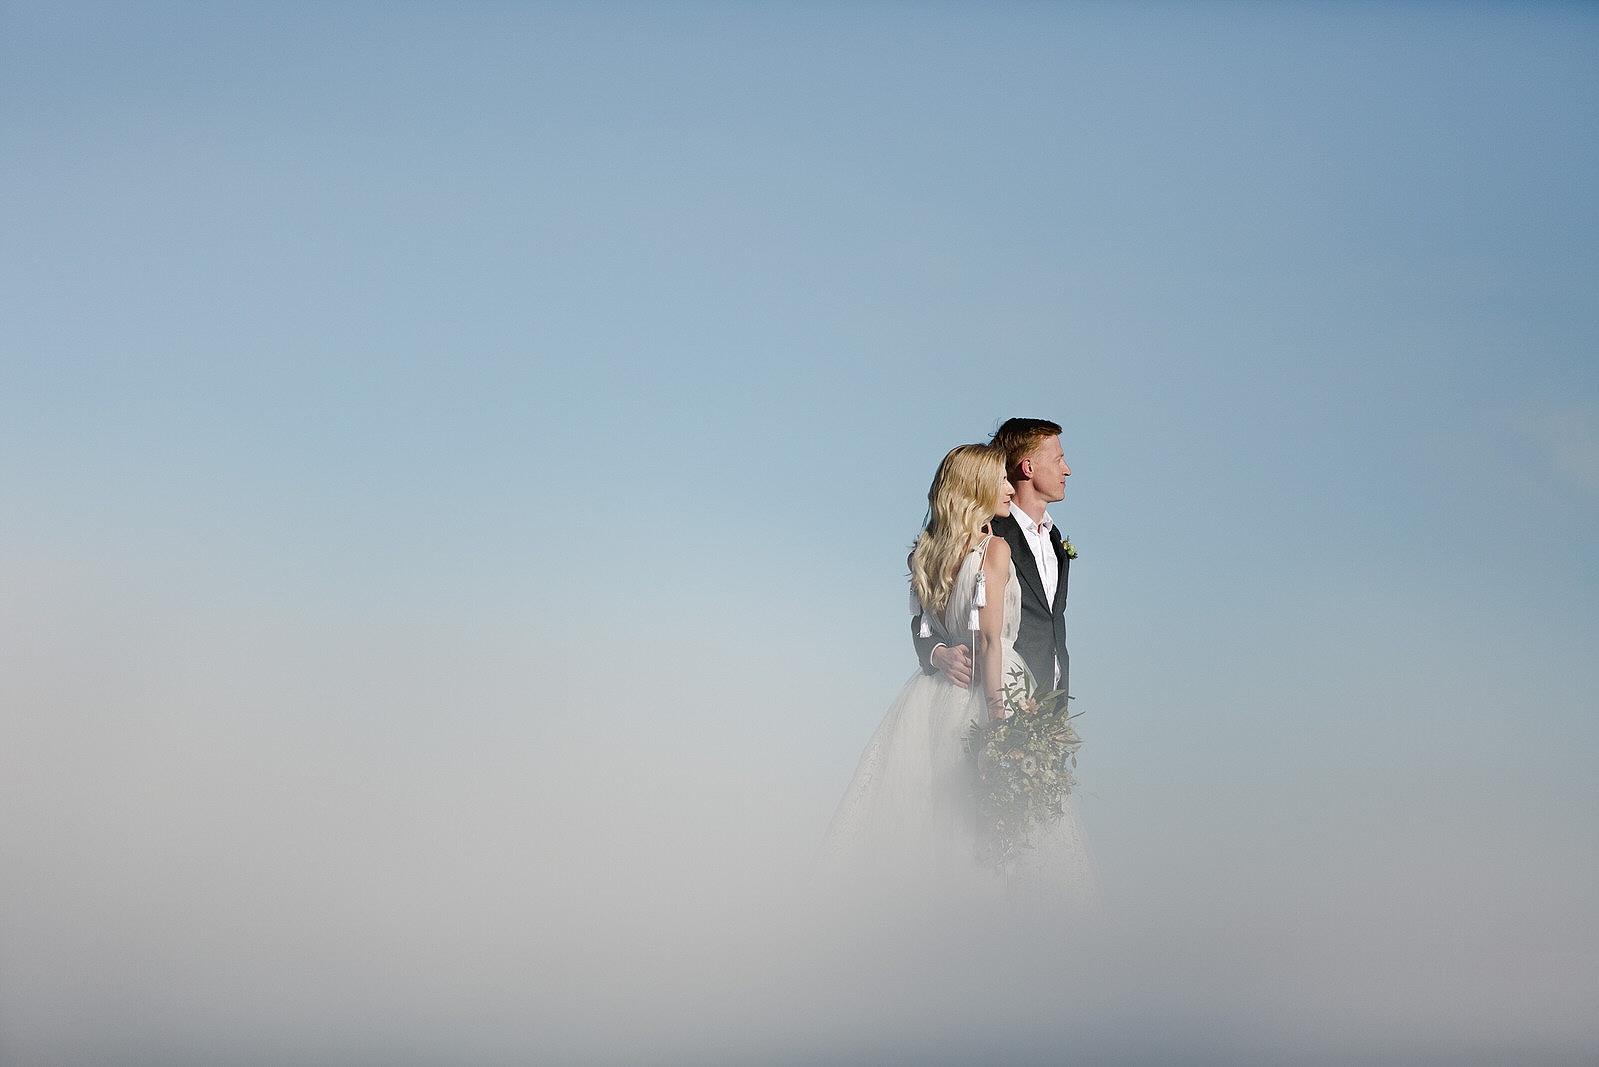 Adventurous+Dolomites+Elopement+Wedding+Fotomagoria13.jpg